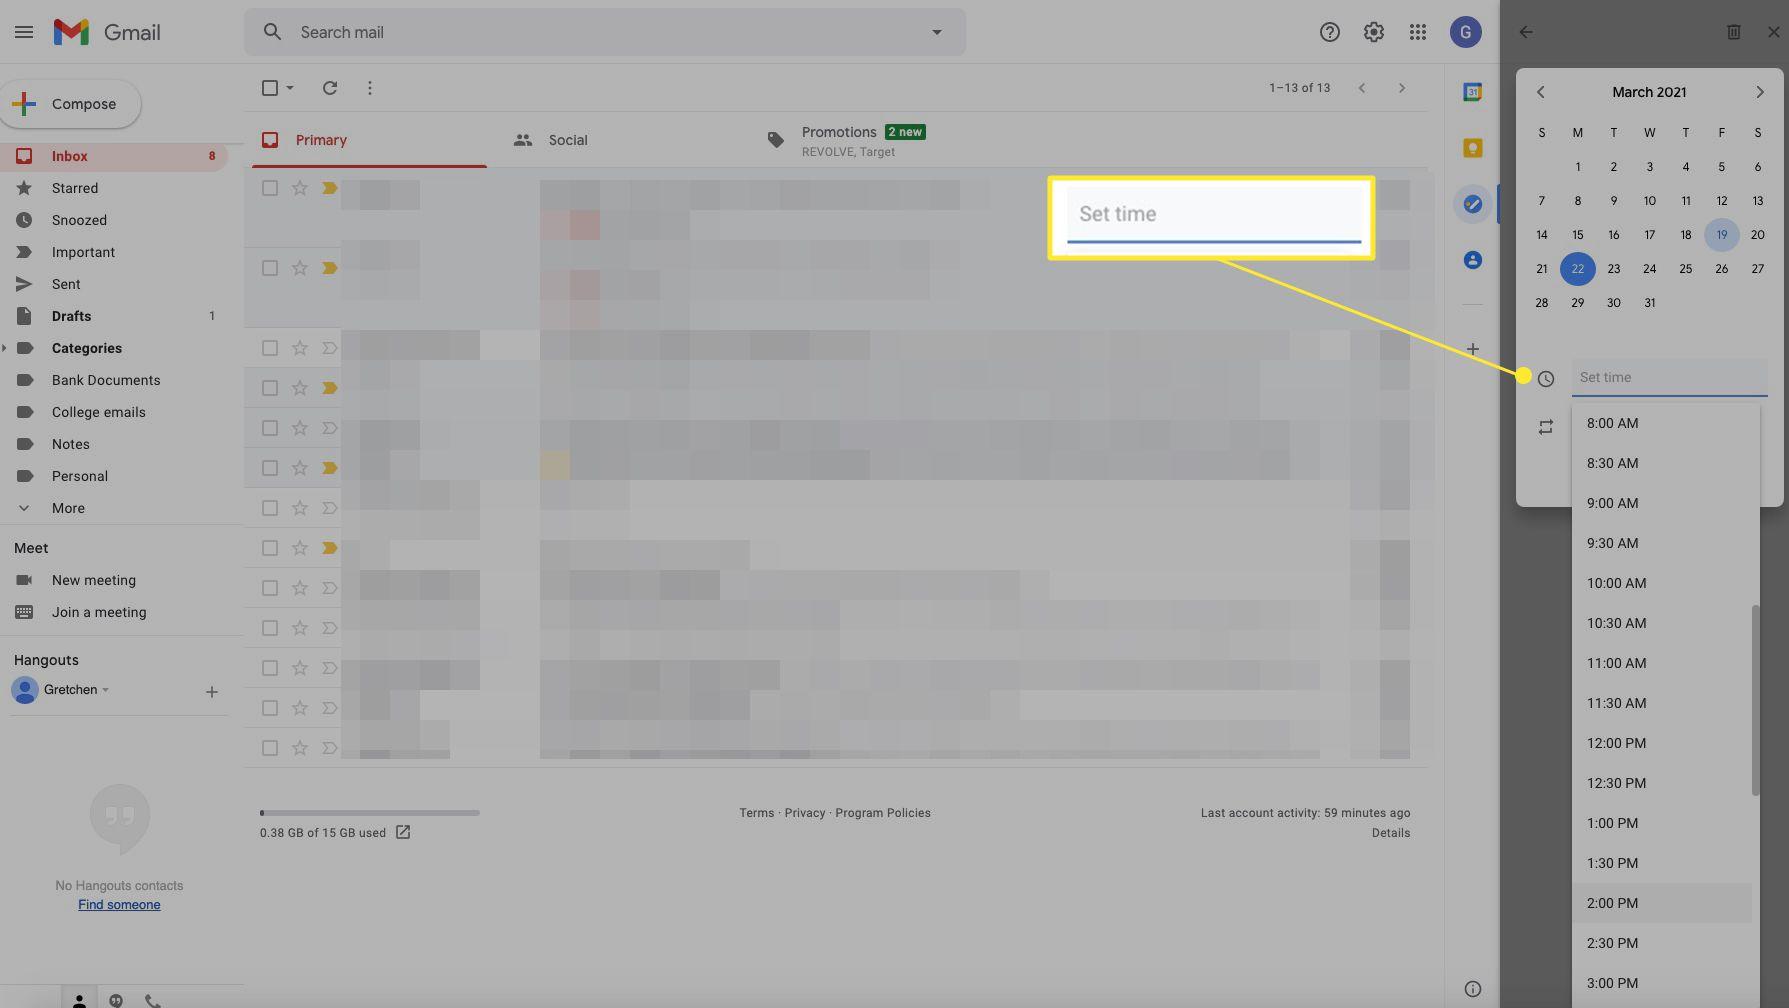 Gmail task window with